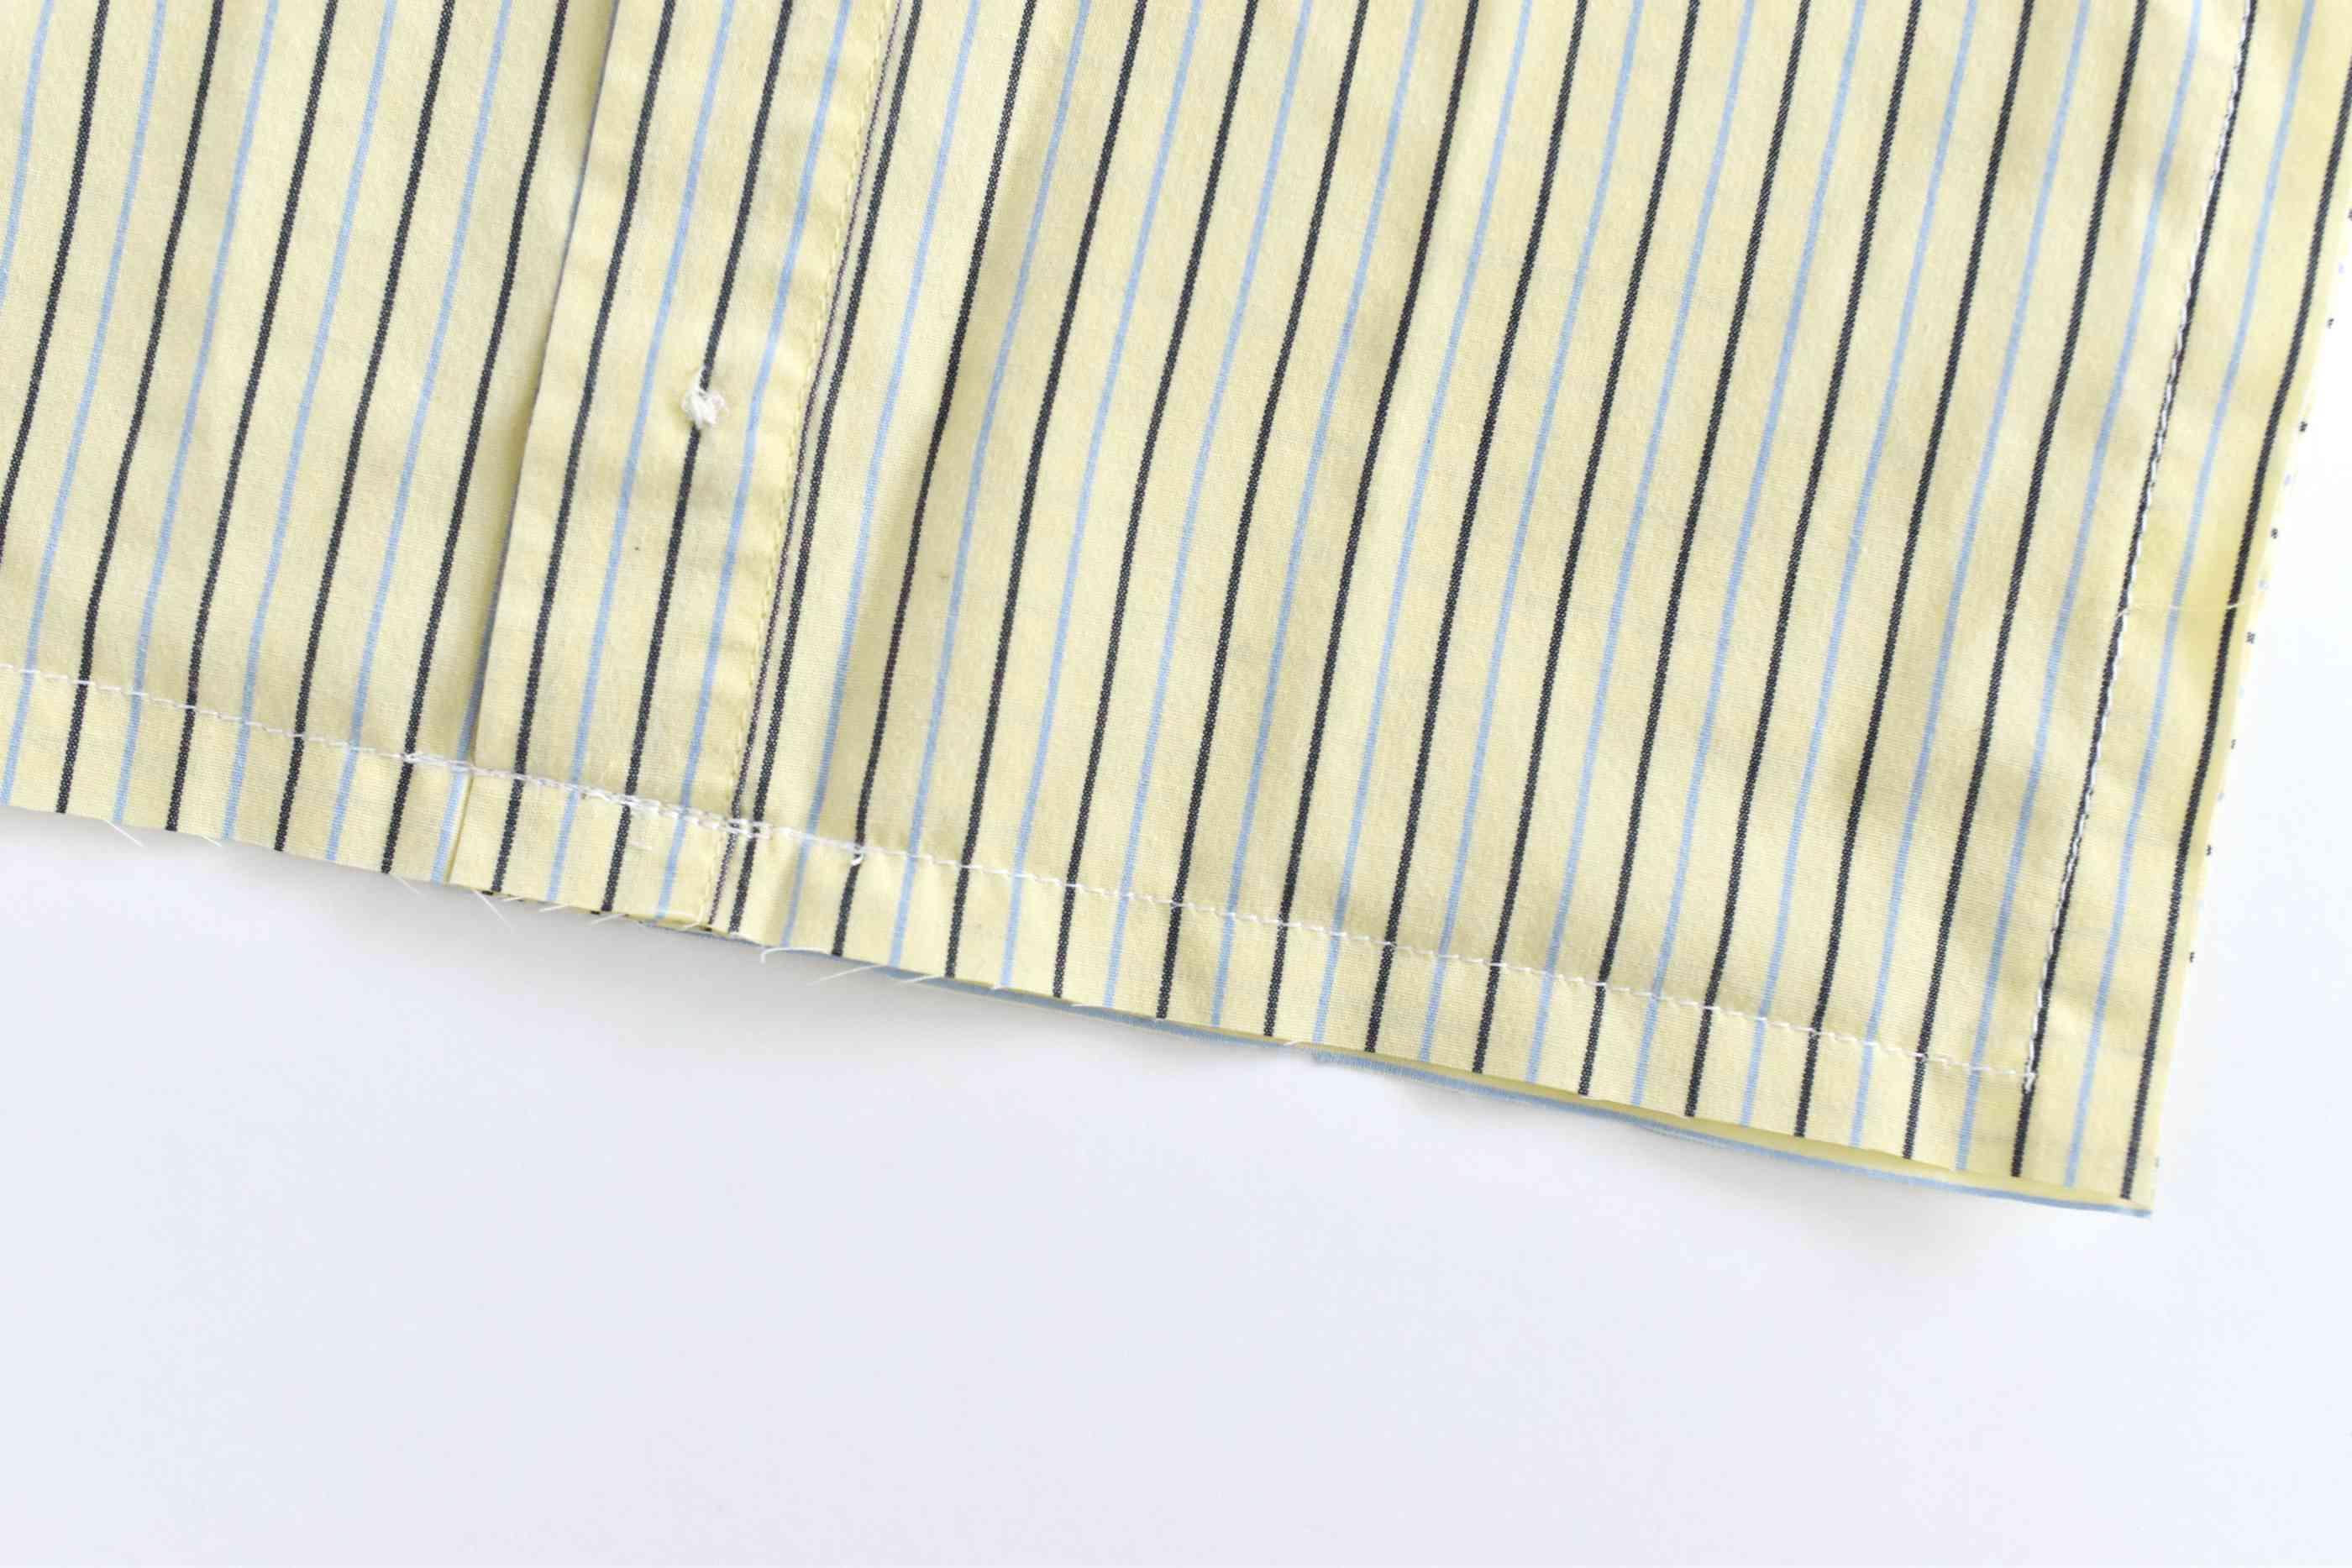 Sew Around All Four Sides